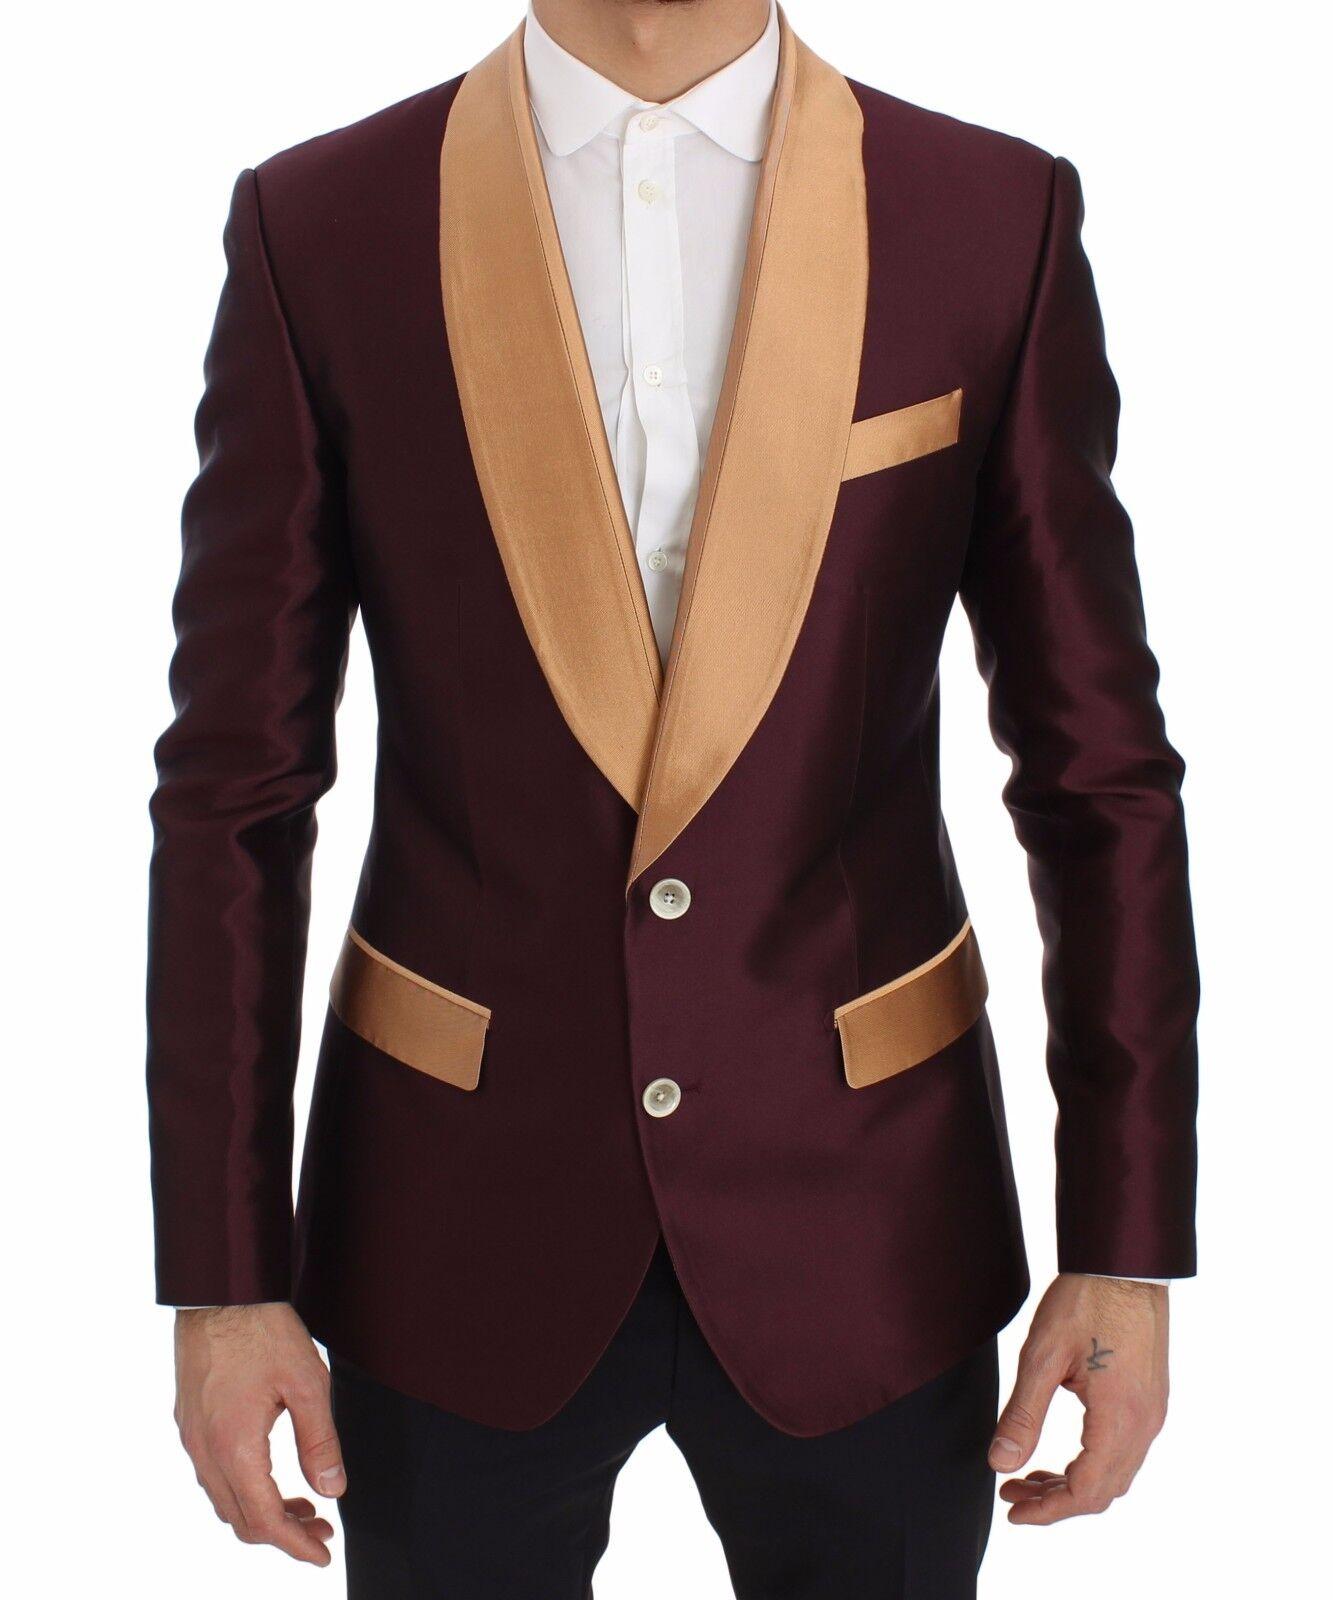 Nuevo Dolce & Gabbana Chaqueta Americana Burdeo Beis Seda Entallado IT50 /